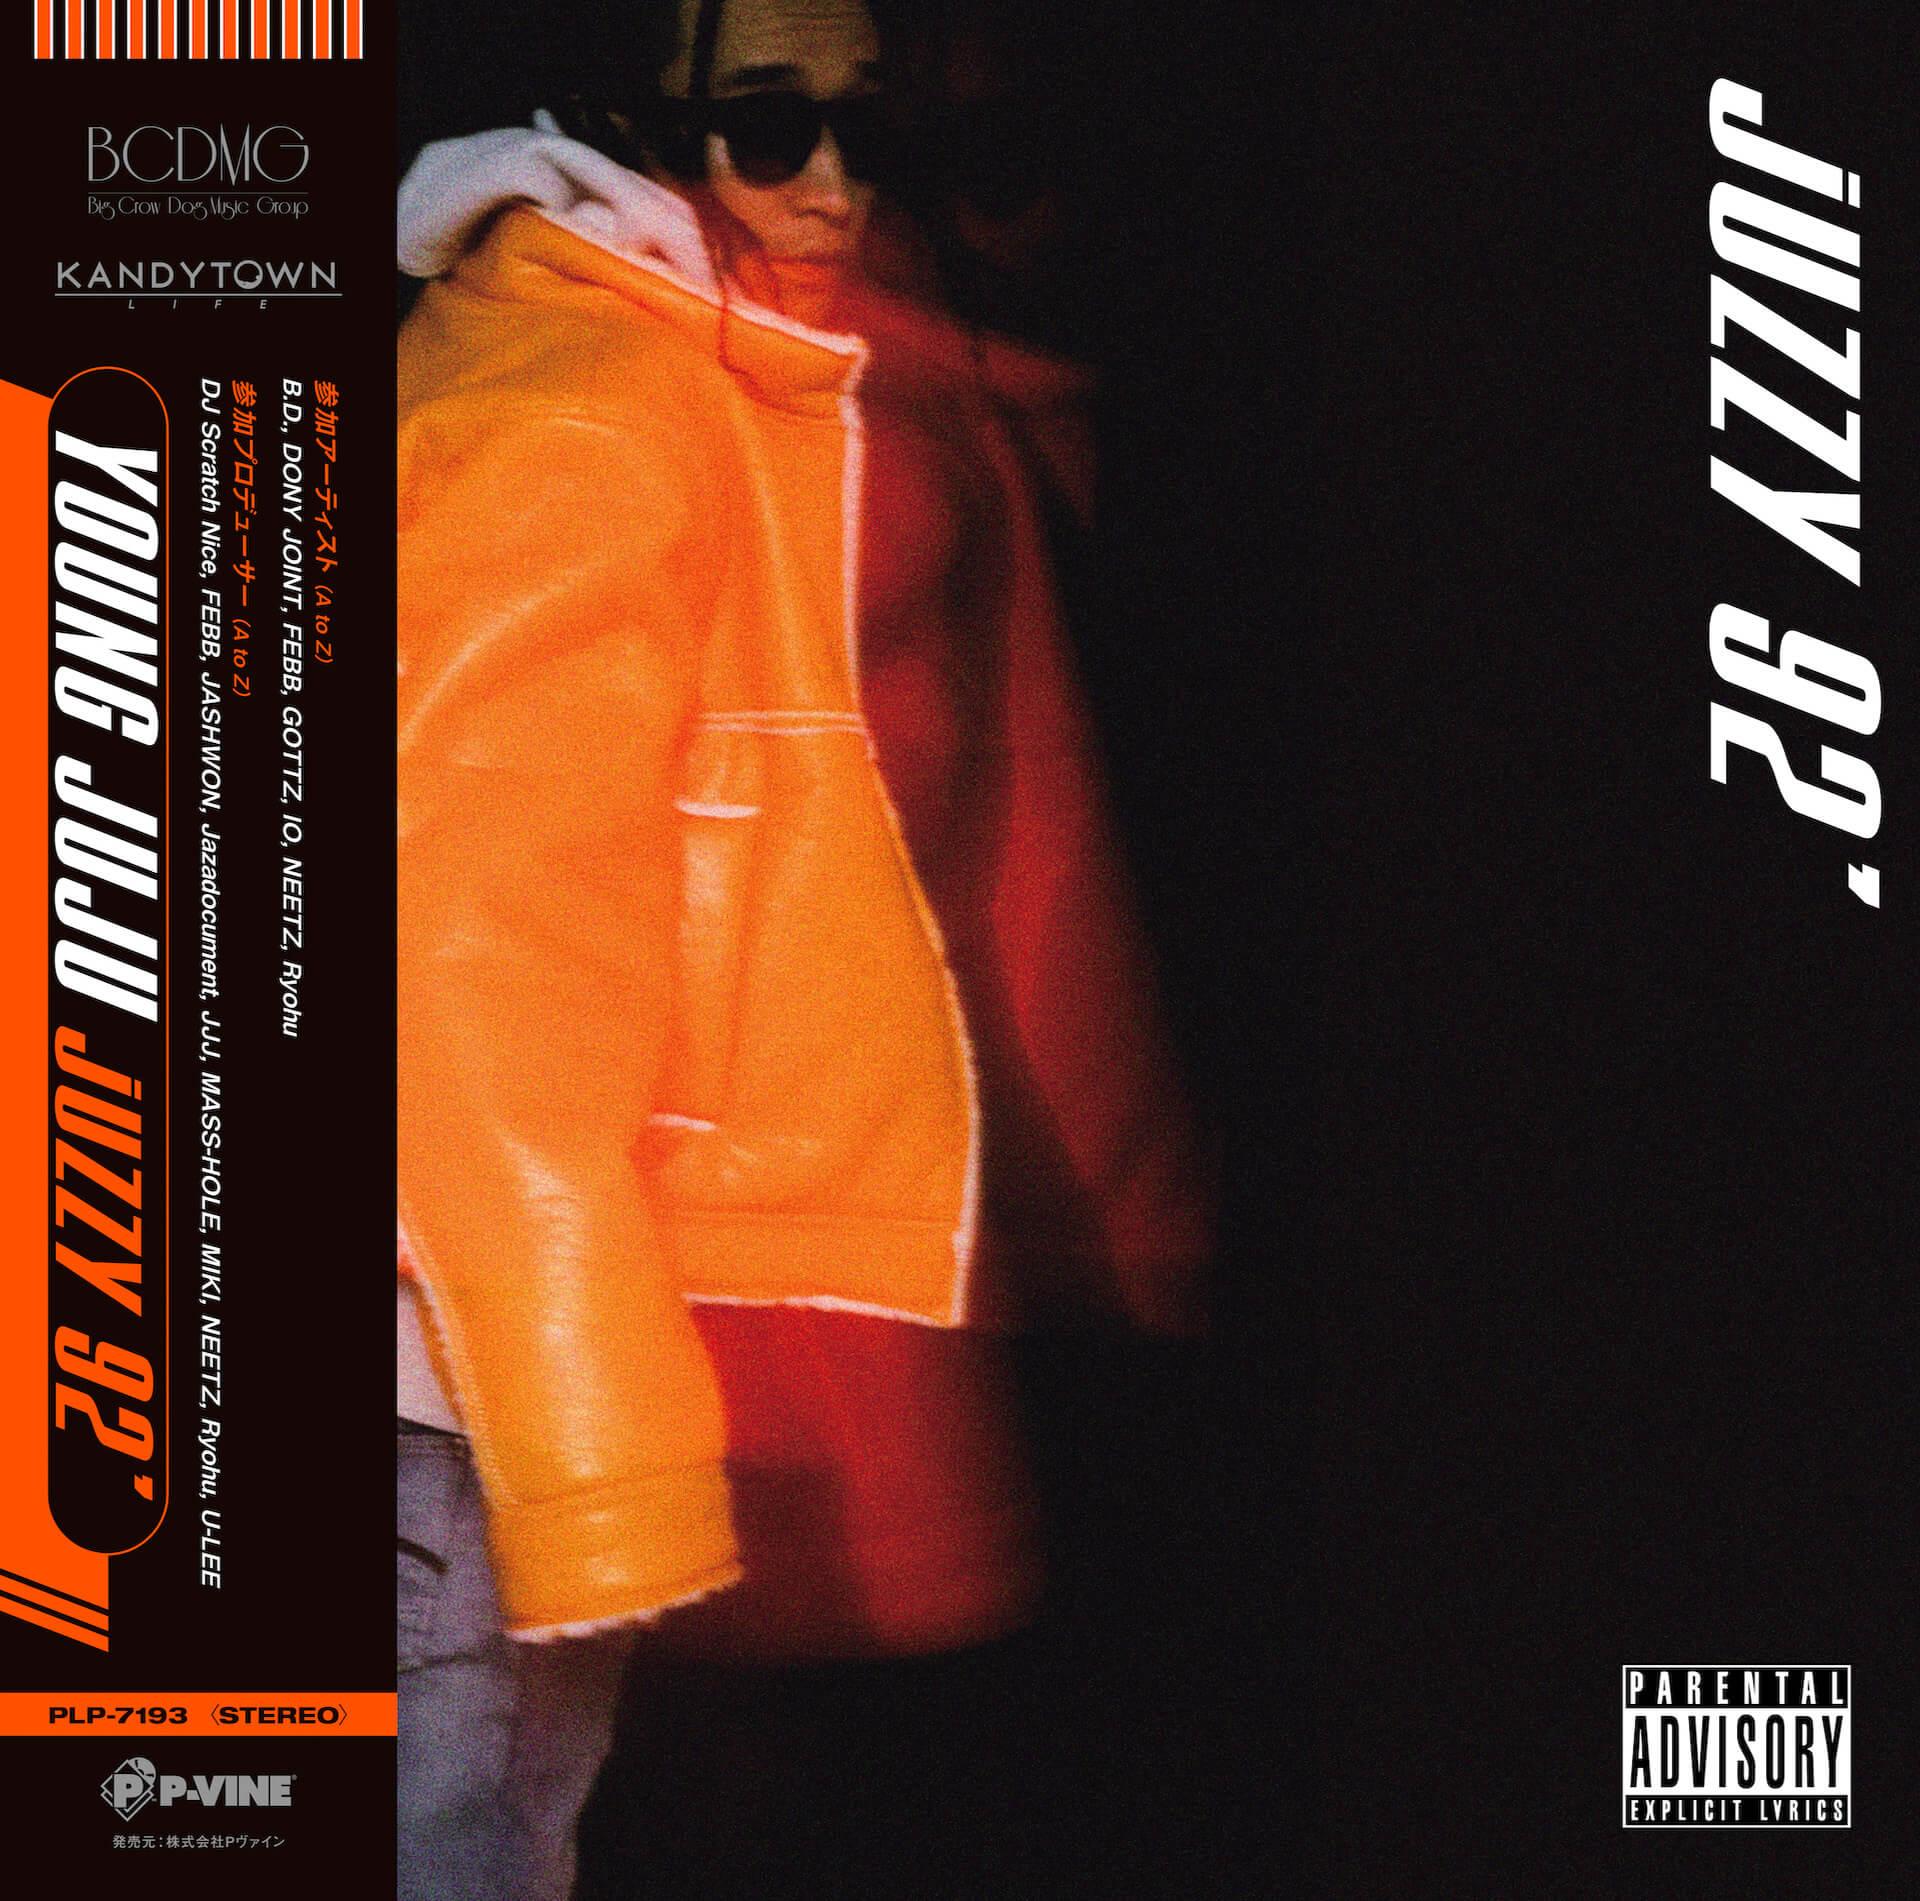 KEIJUがYOUNG JUJU時代の1stソロアルバム『juzzy 92'』を完全限定プレスでアナログ化! music210922_keiju_youngjuju_1